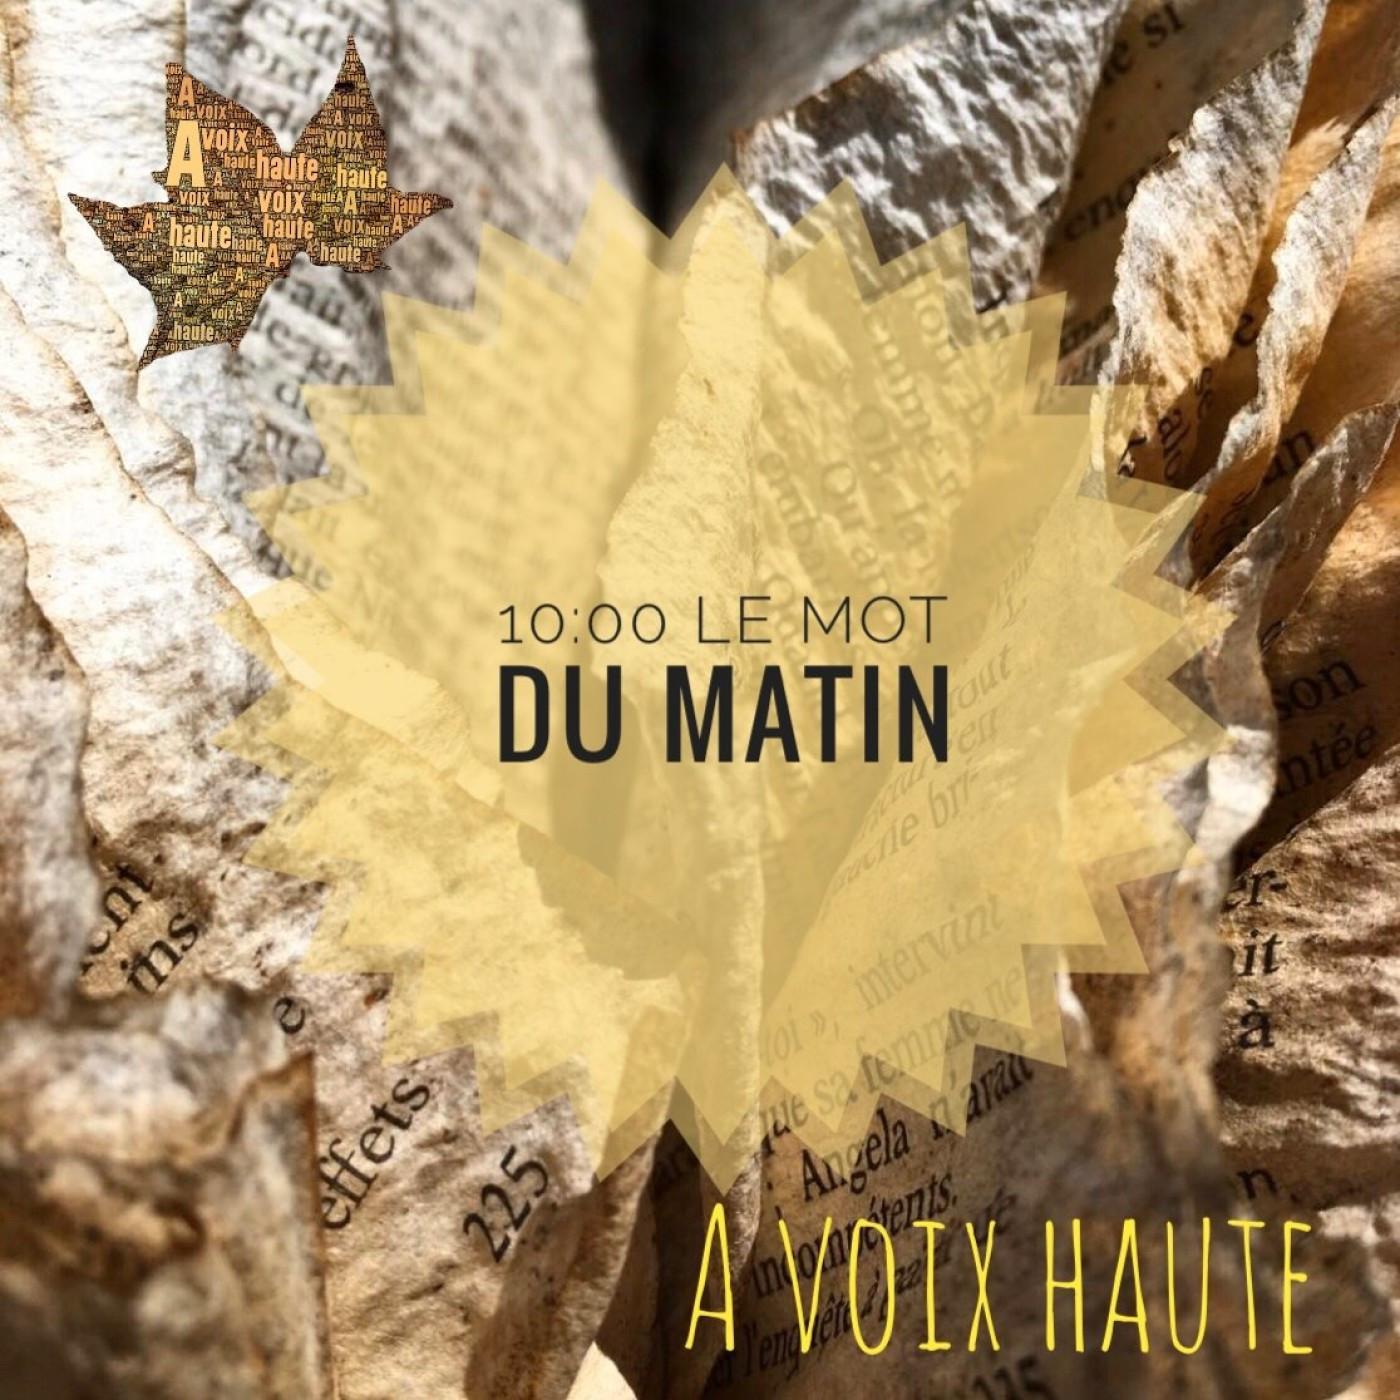 2 - LE MOT DU MATIN - Saint Exupery - Yannick Debain